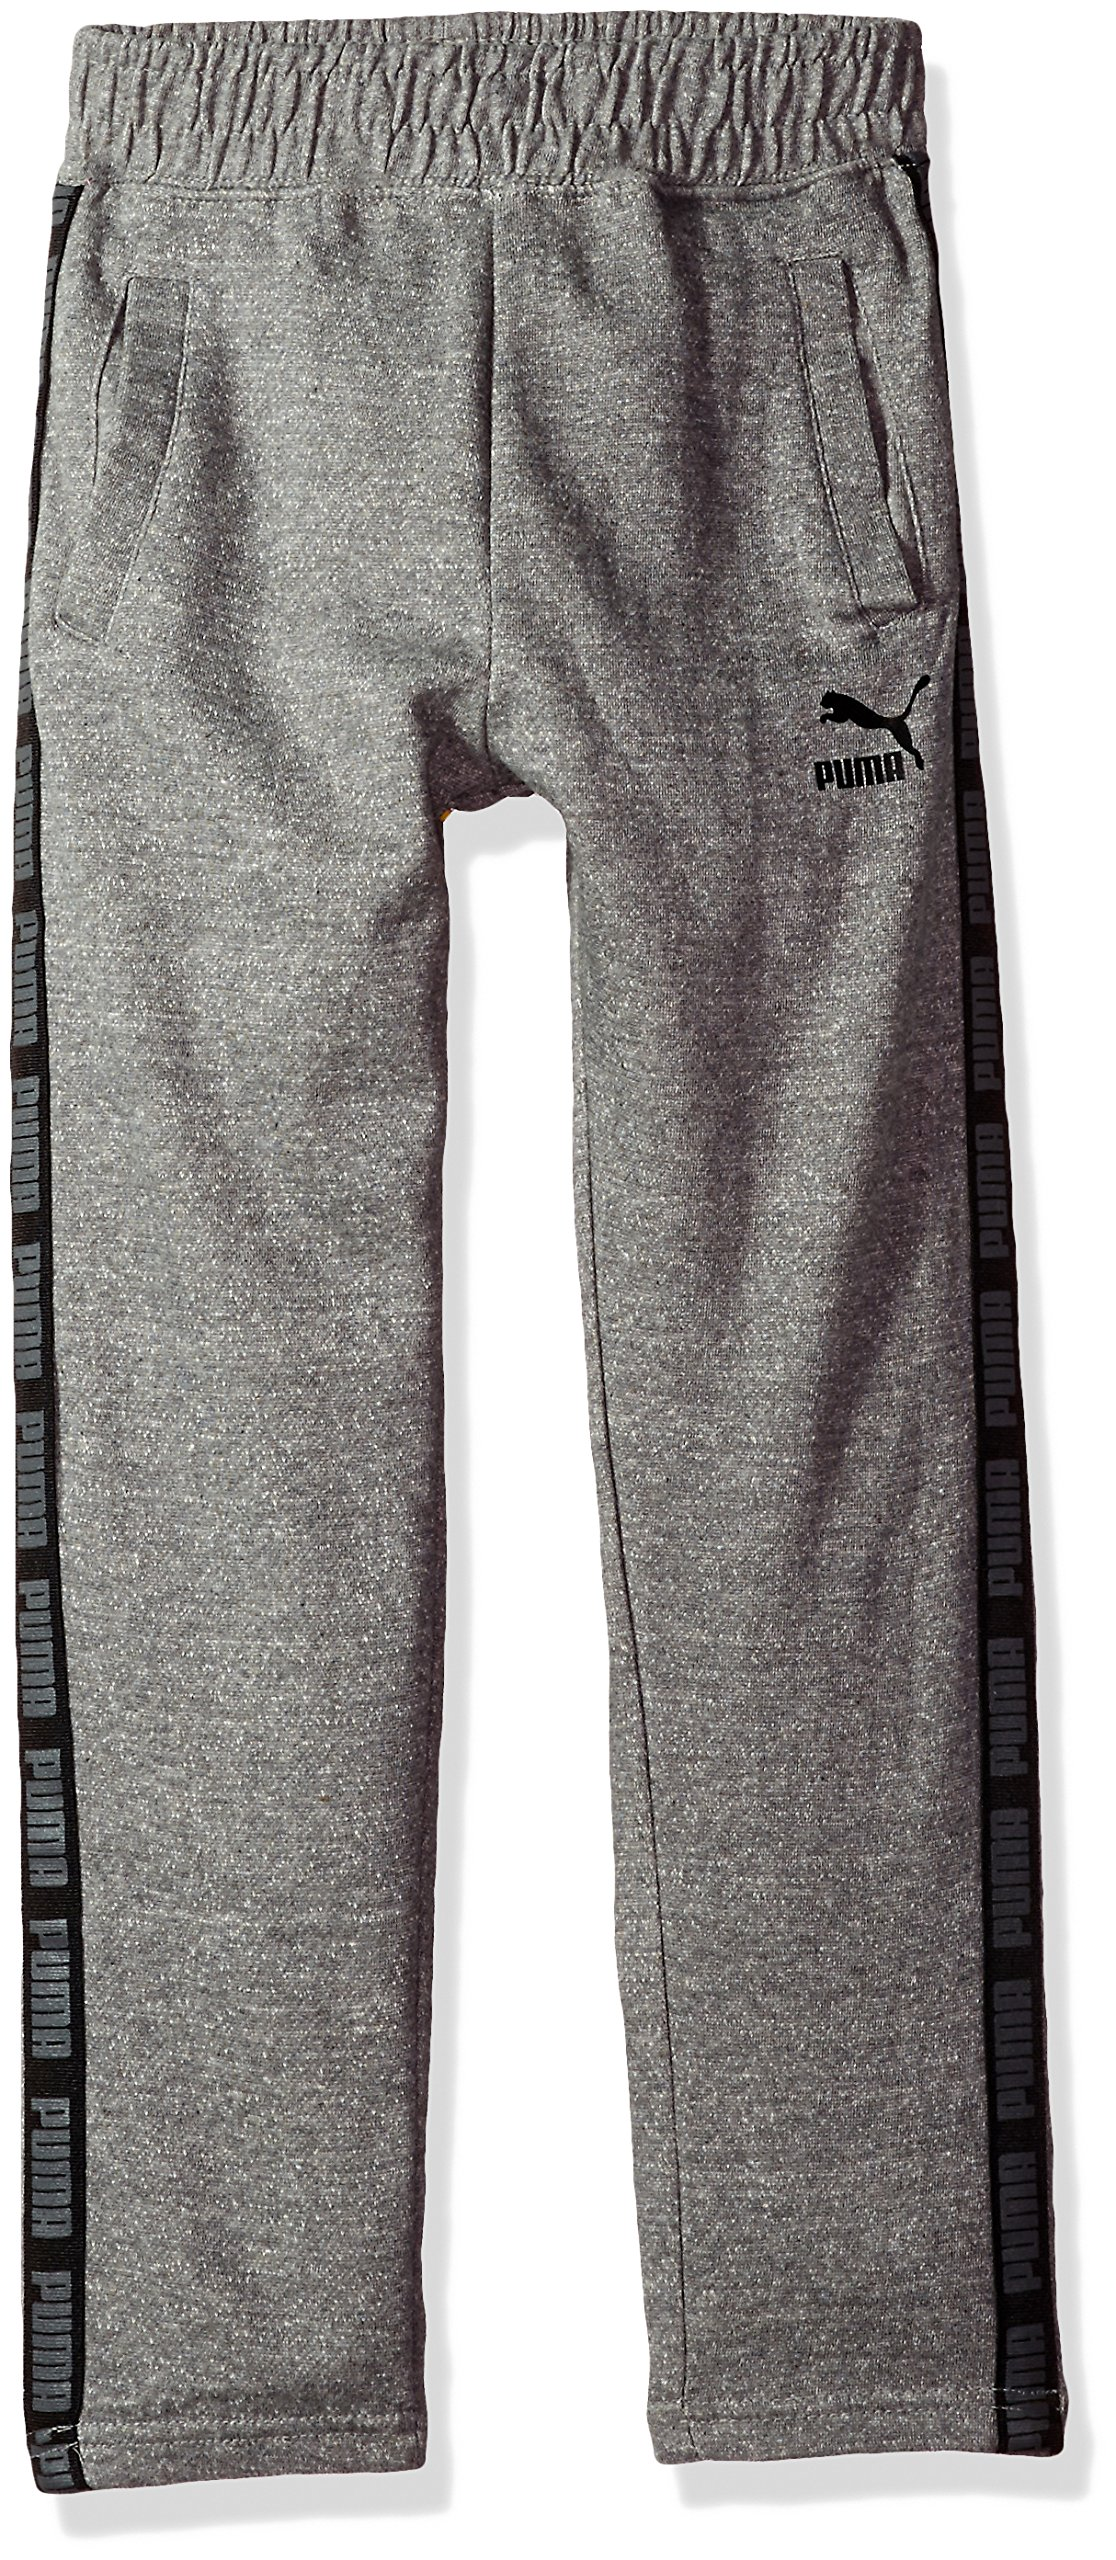 PUMA Big Boys' Tapered Pant, Charcoal Heather, Large (14/16)